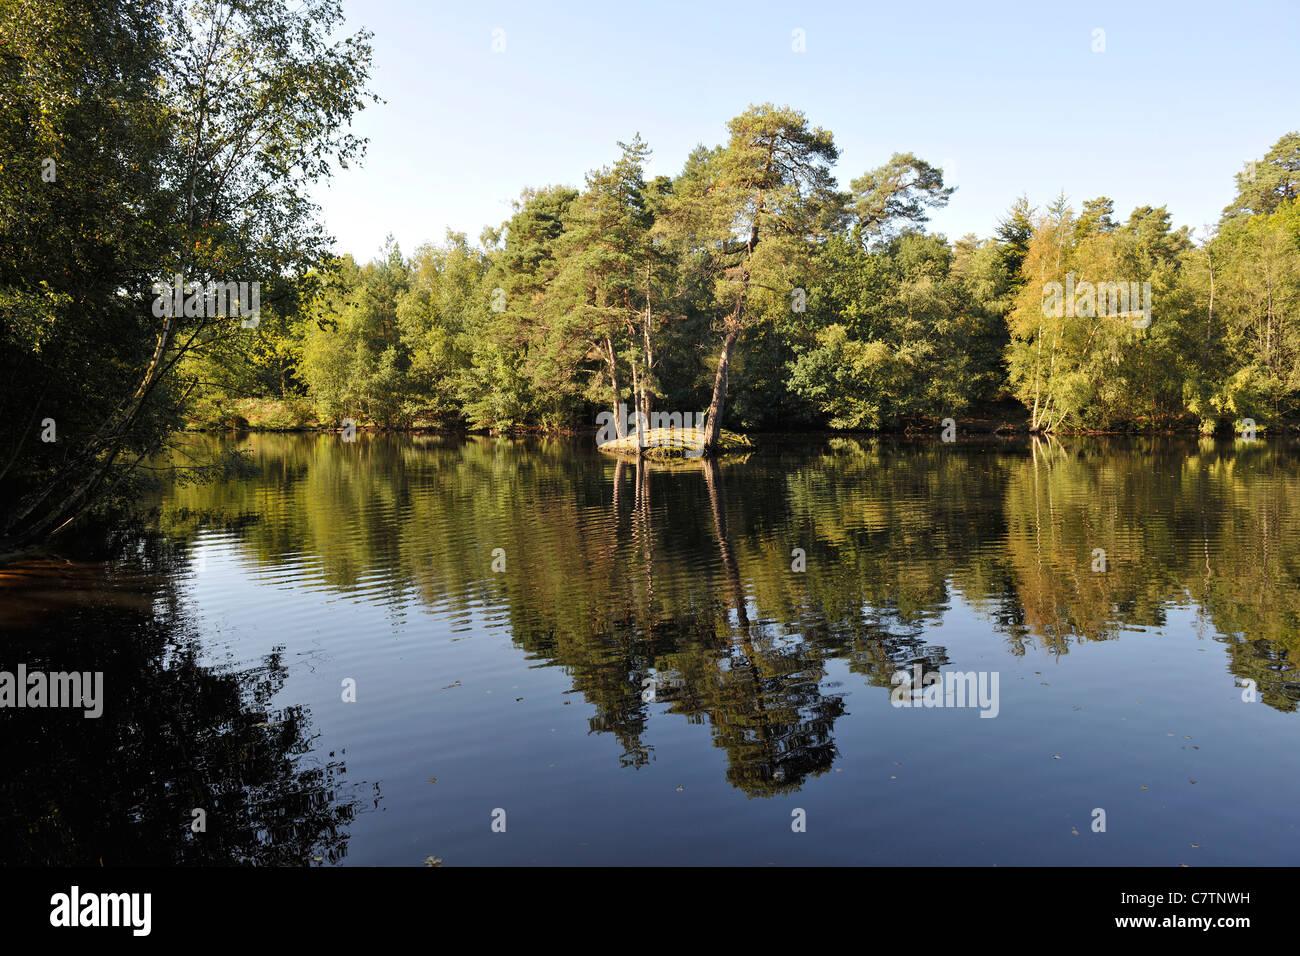 Heath Pool, Simon's Wood, Crowthorne -1 - Stock Image